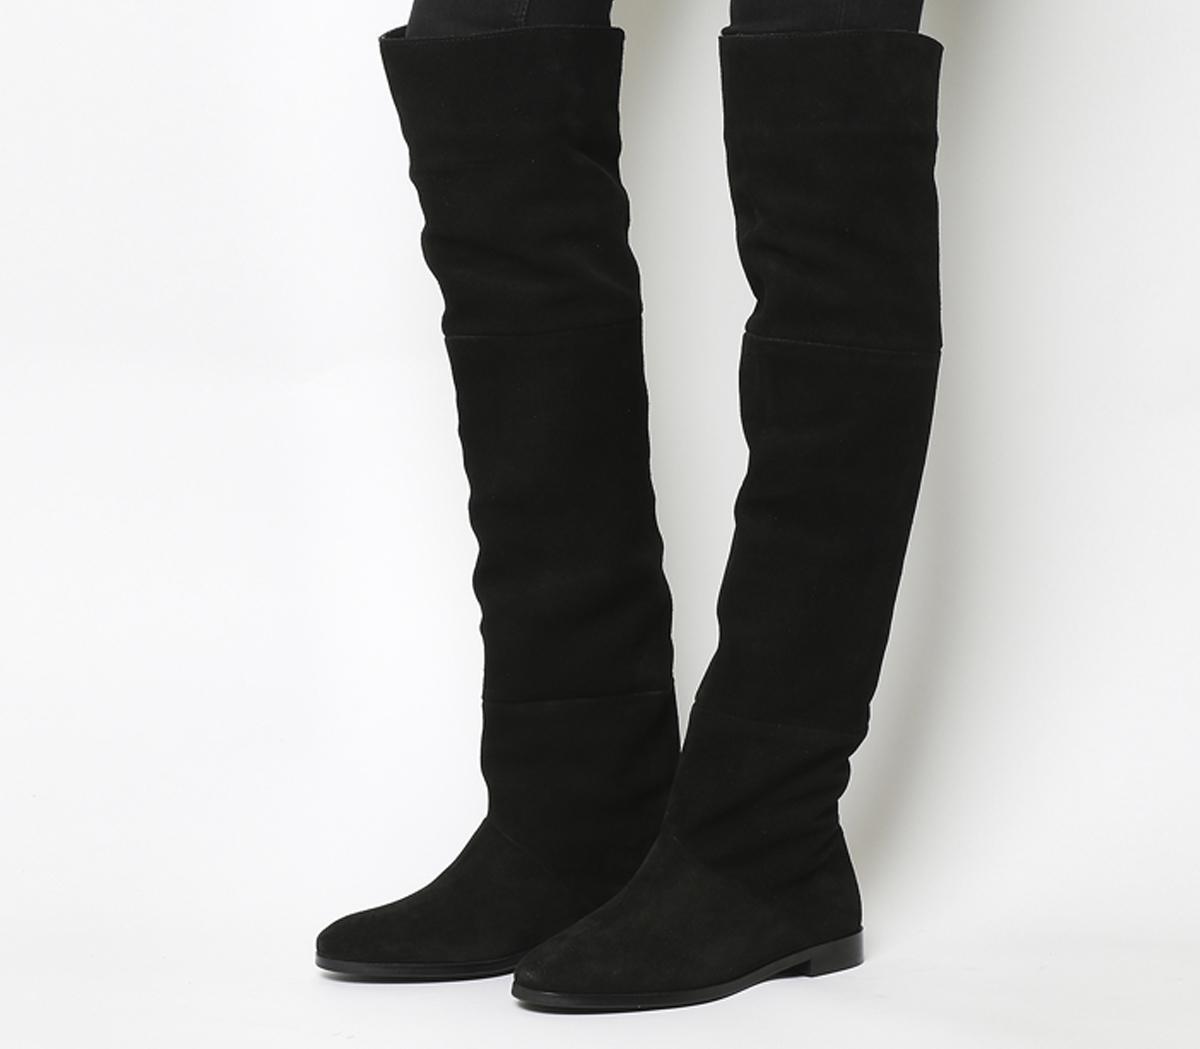 Nova Thigh High Boots